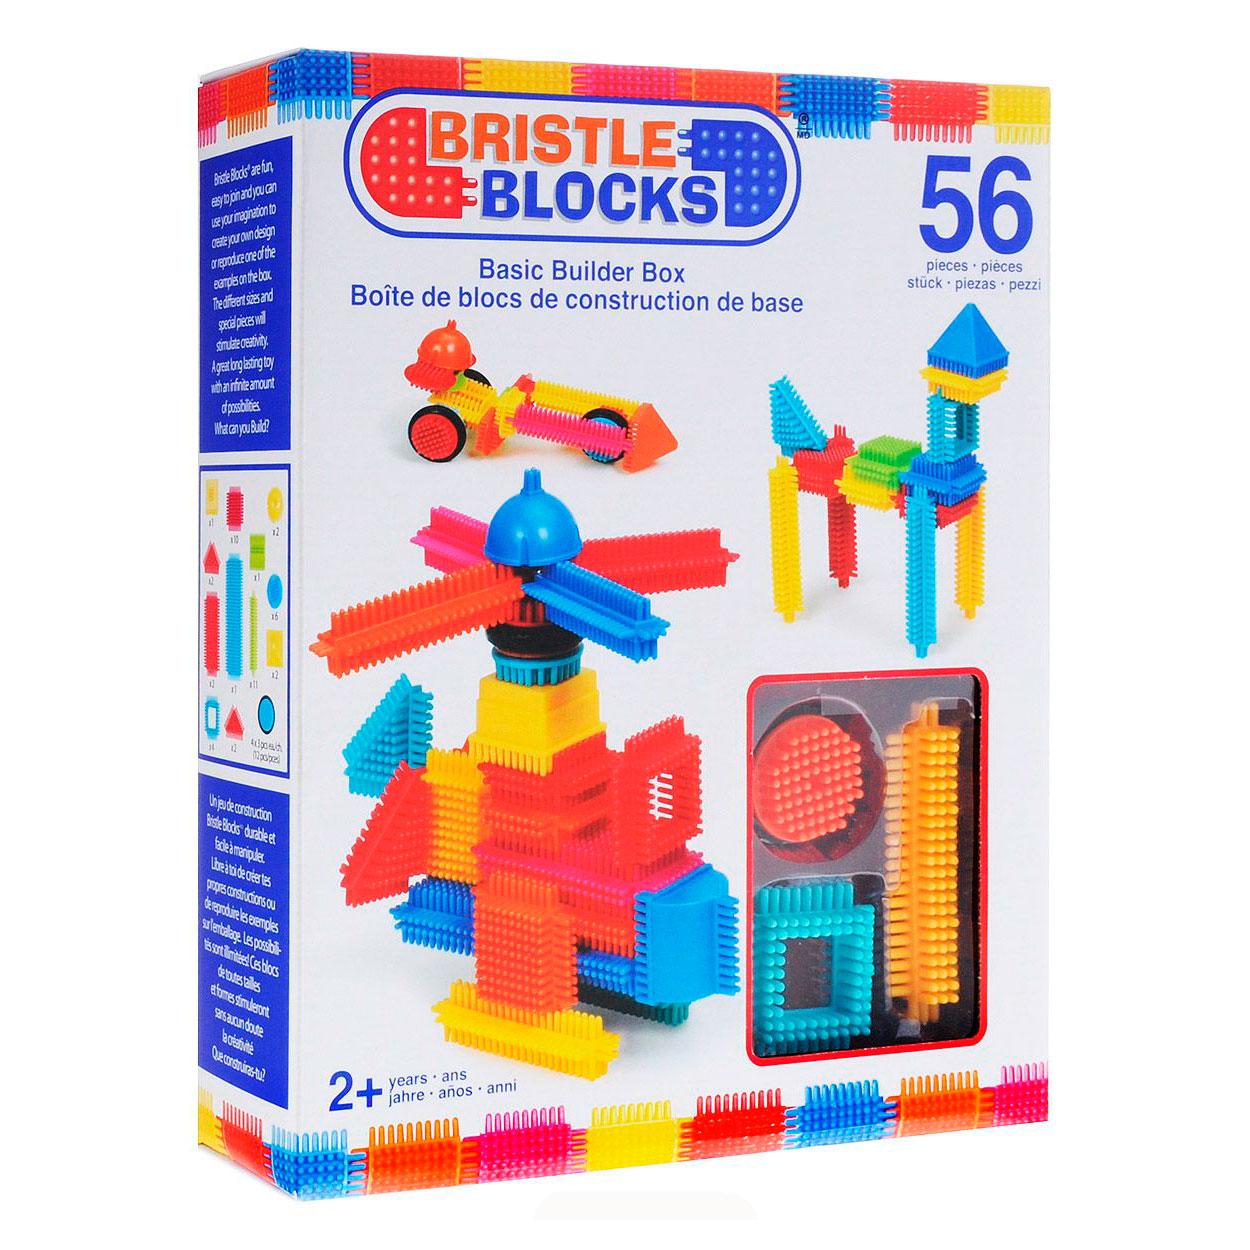 Конструктор Bristle Blocks 56 деталей в коробке<br>